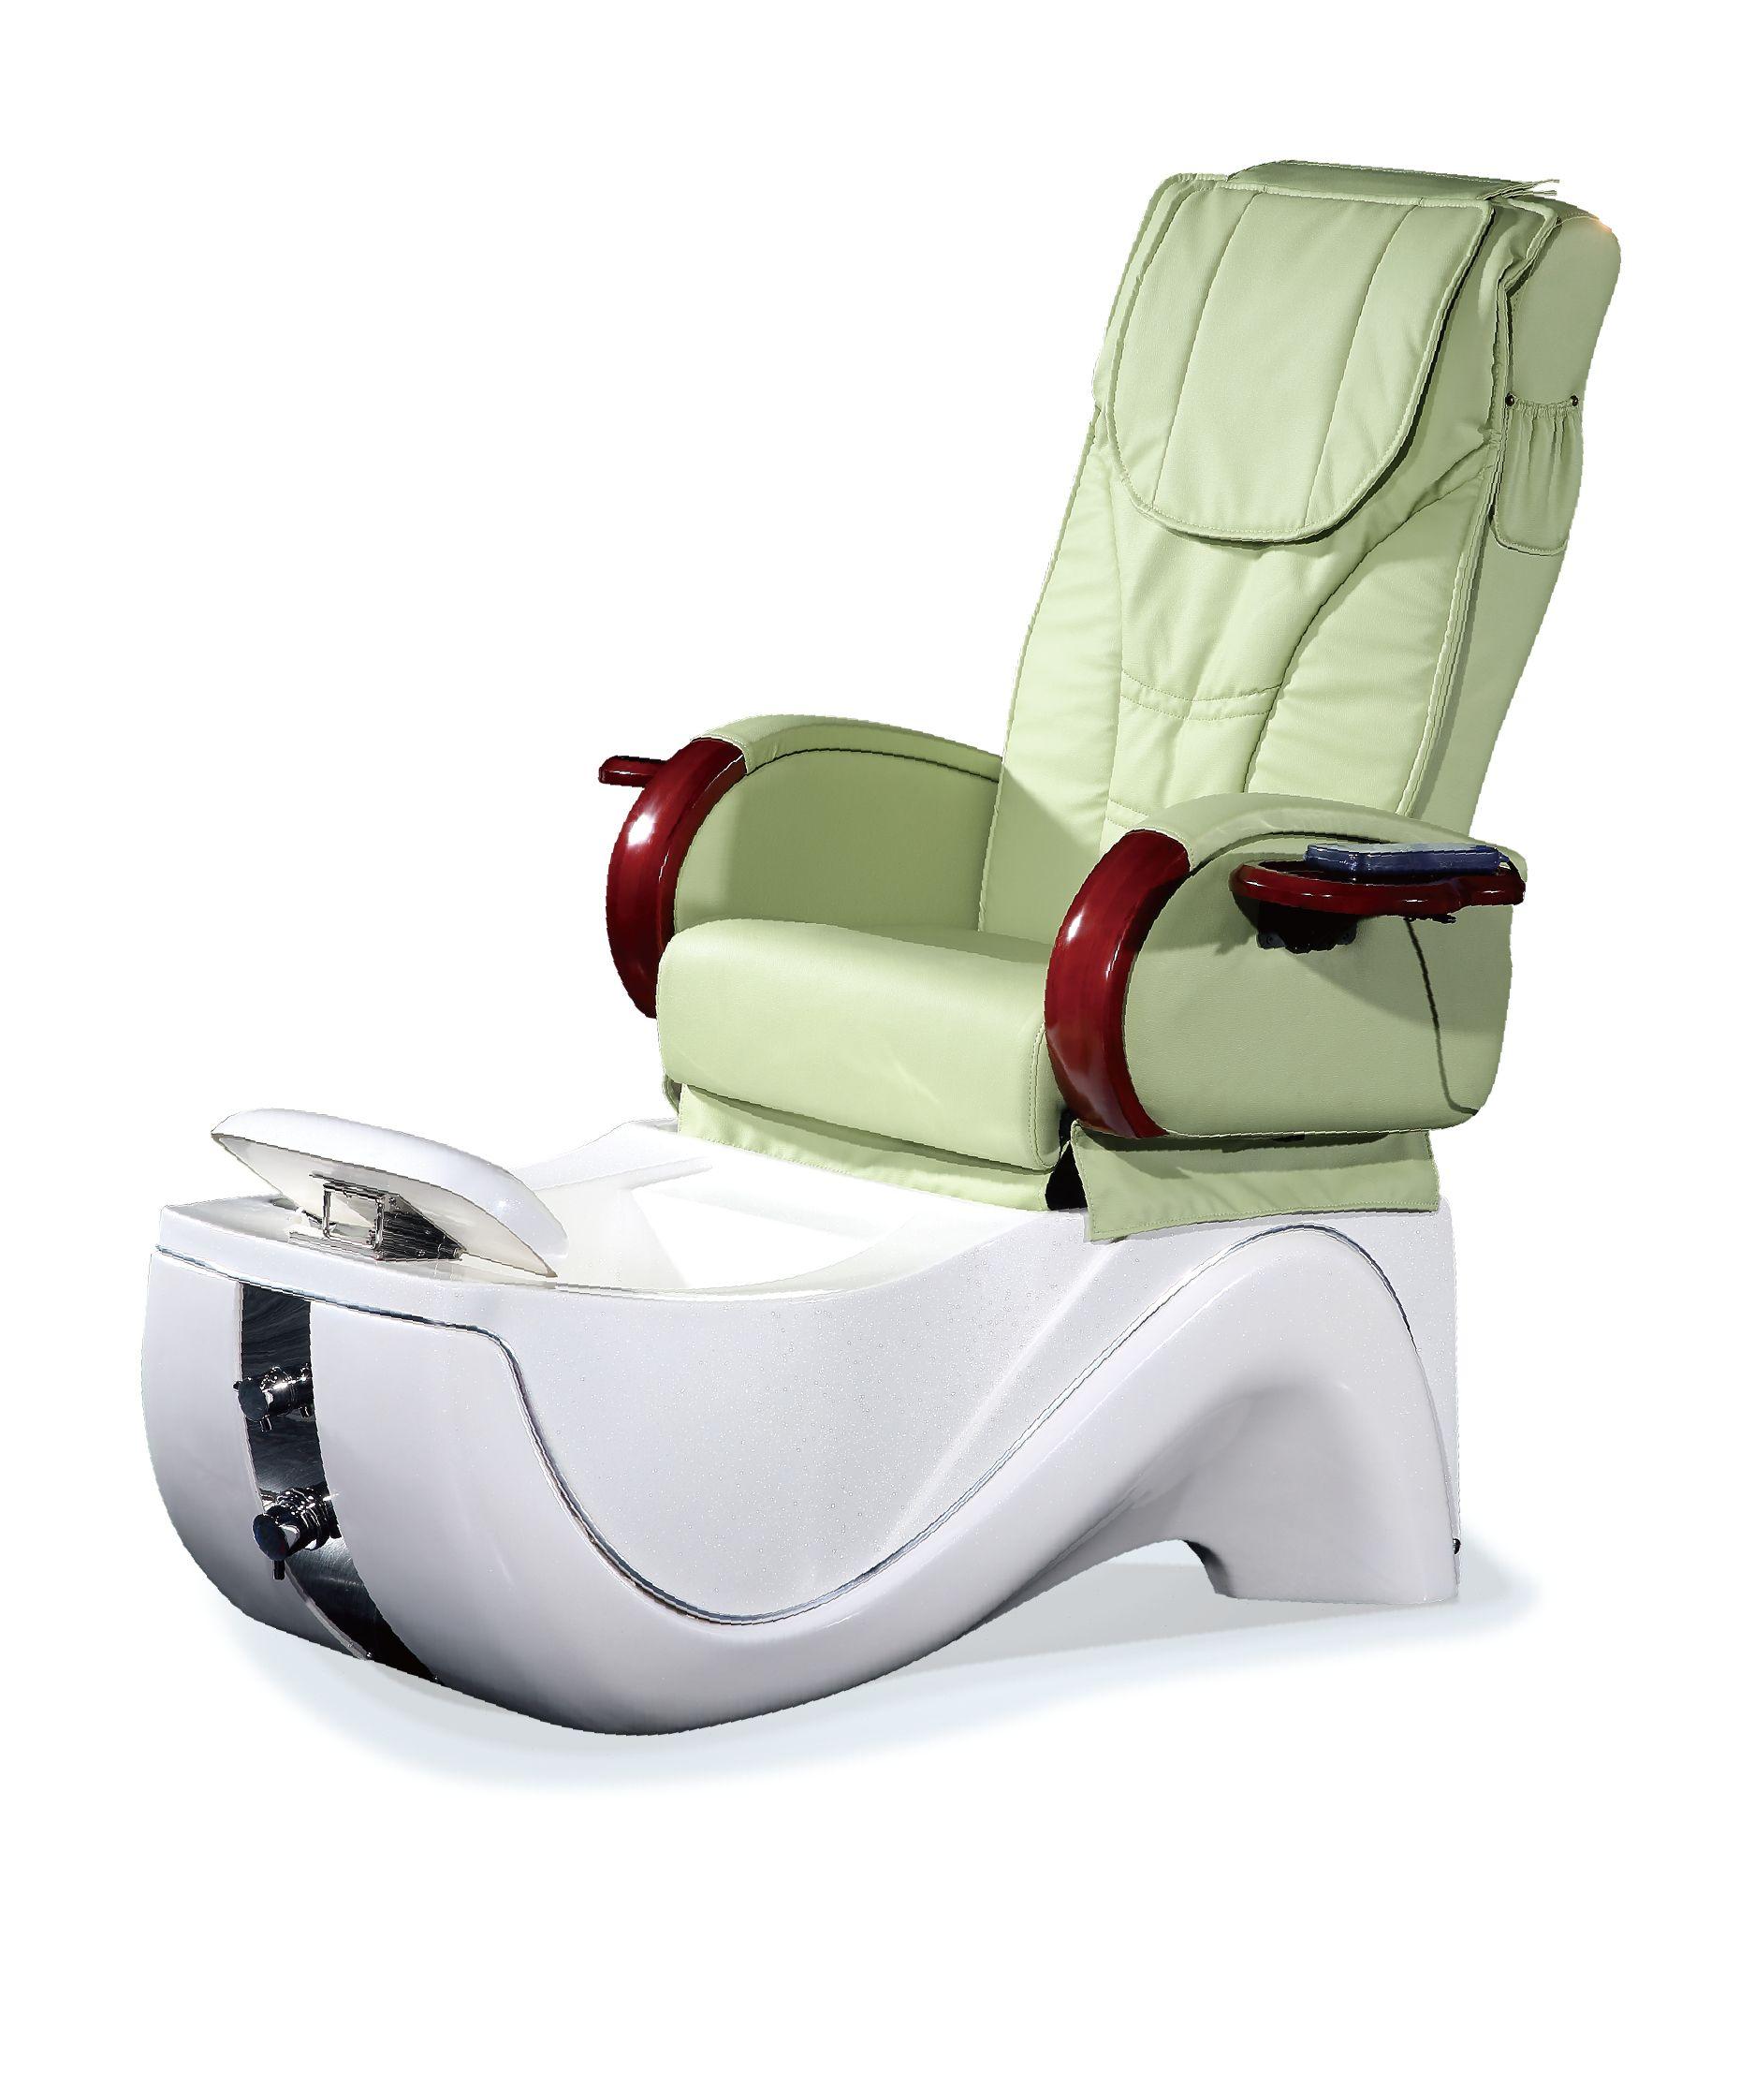 Best 2016 Shiatsu Massage Pipless Jet Whirlpooling Fiberglass